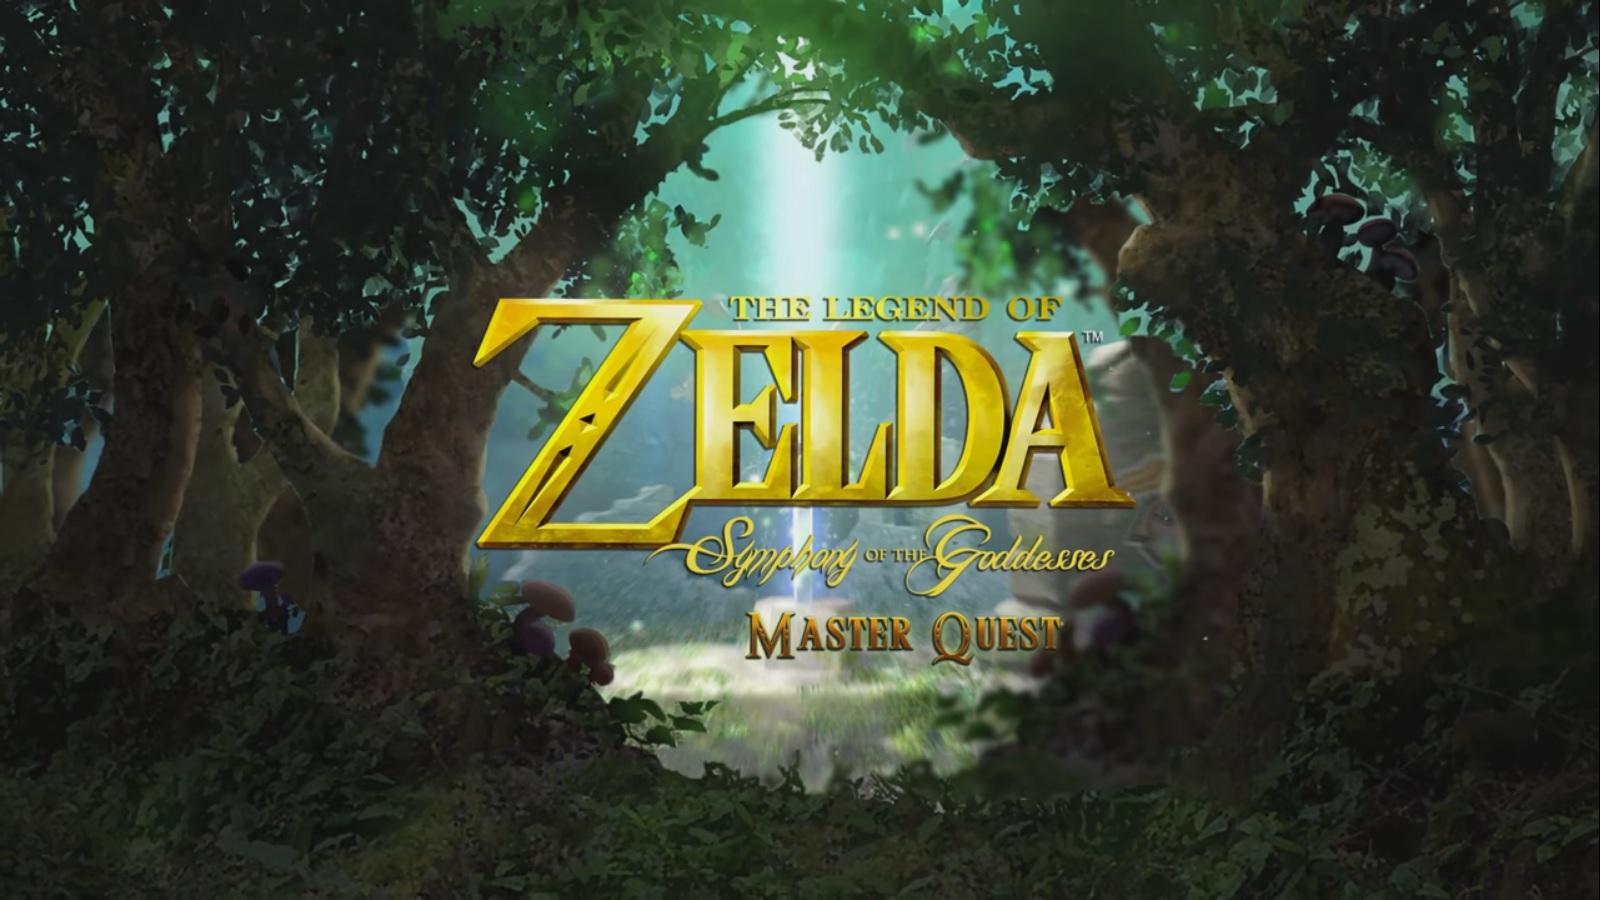 zelda-symphony-goddesses-master-quest